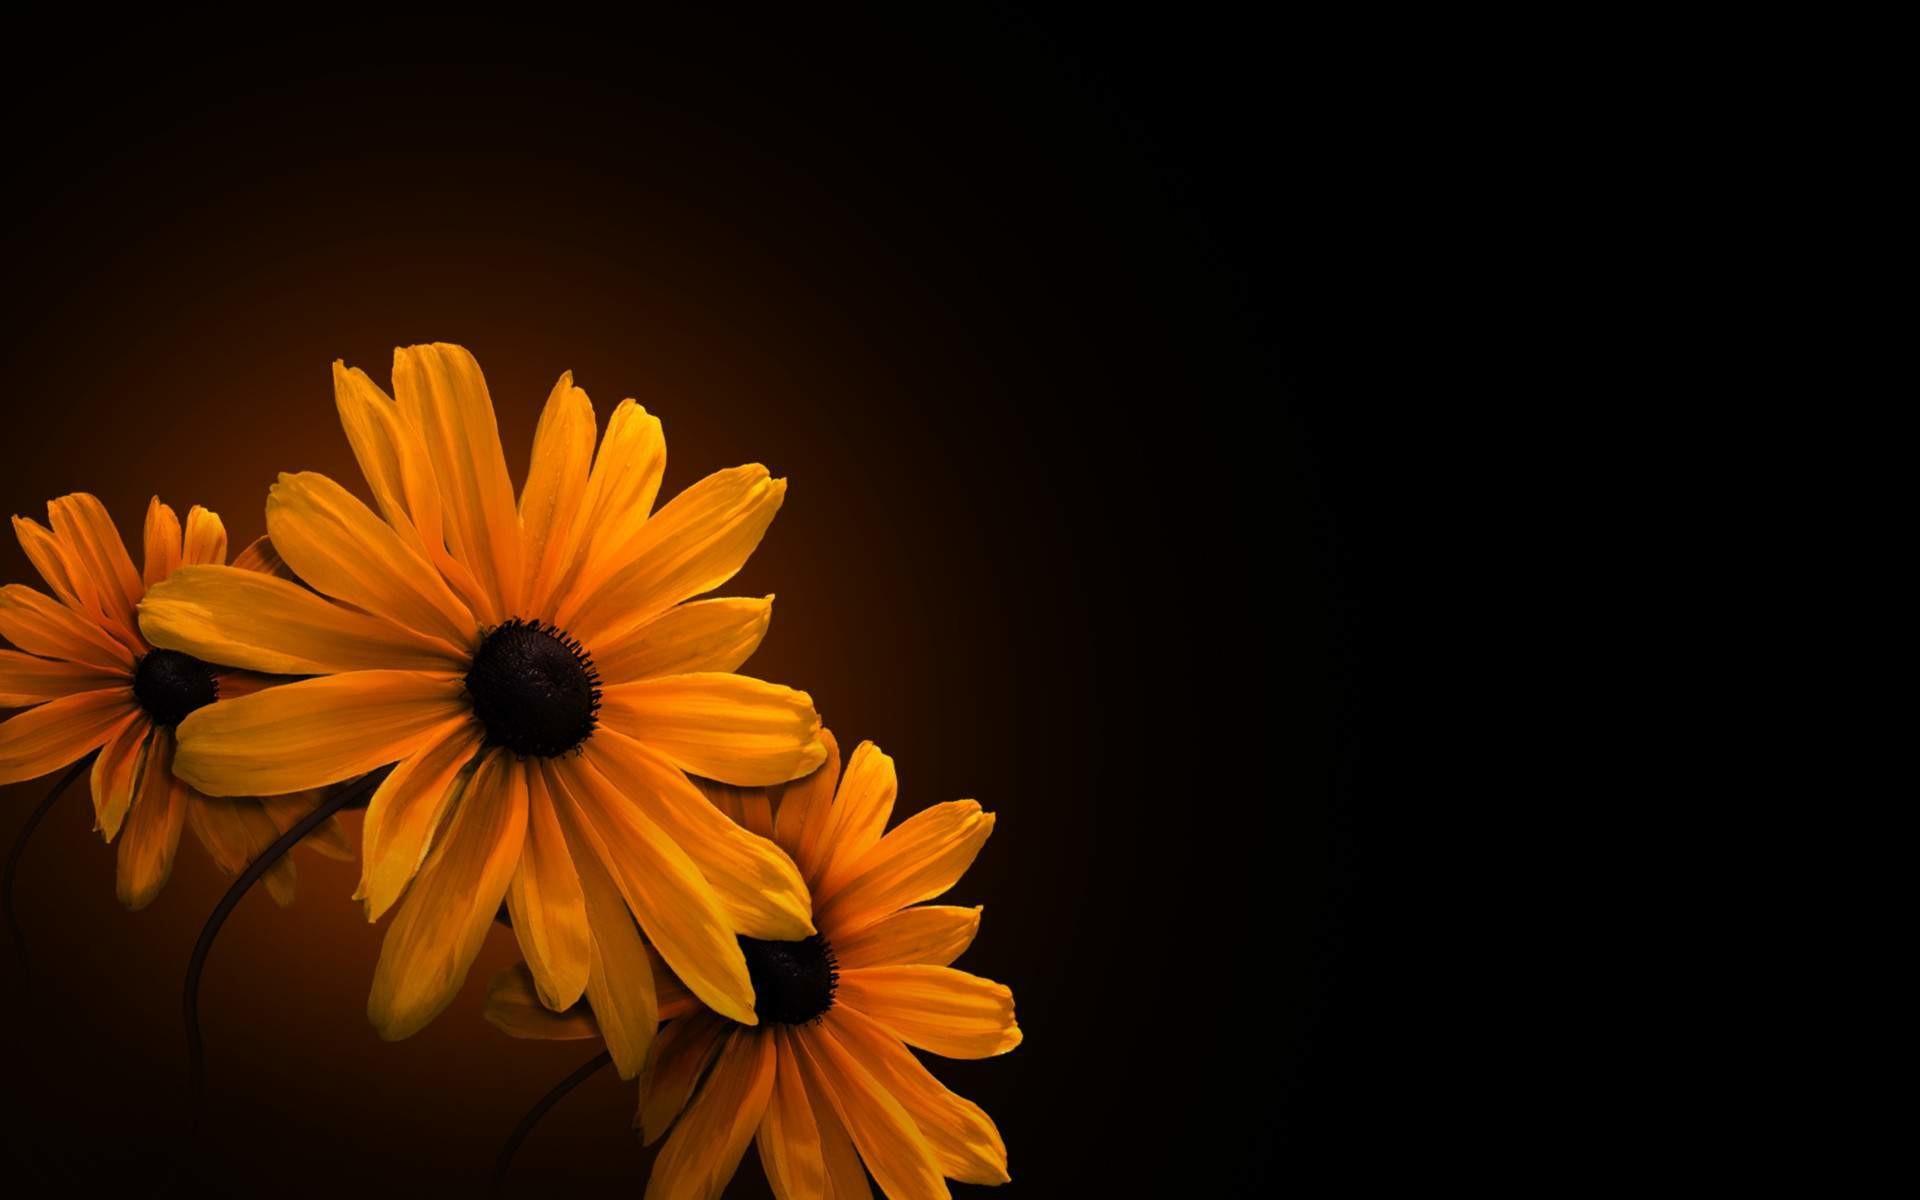 Yellow flower black background Wallpaper iPhone Pinterest 1920×1200